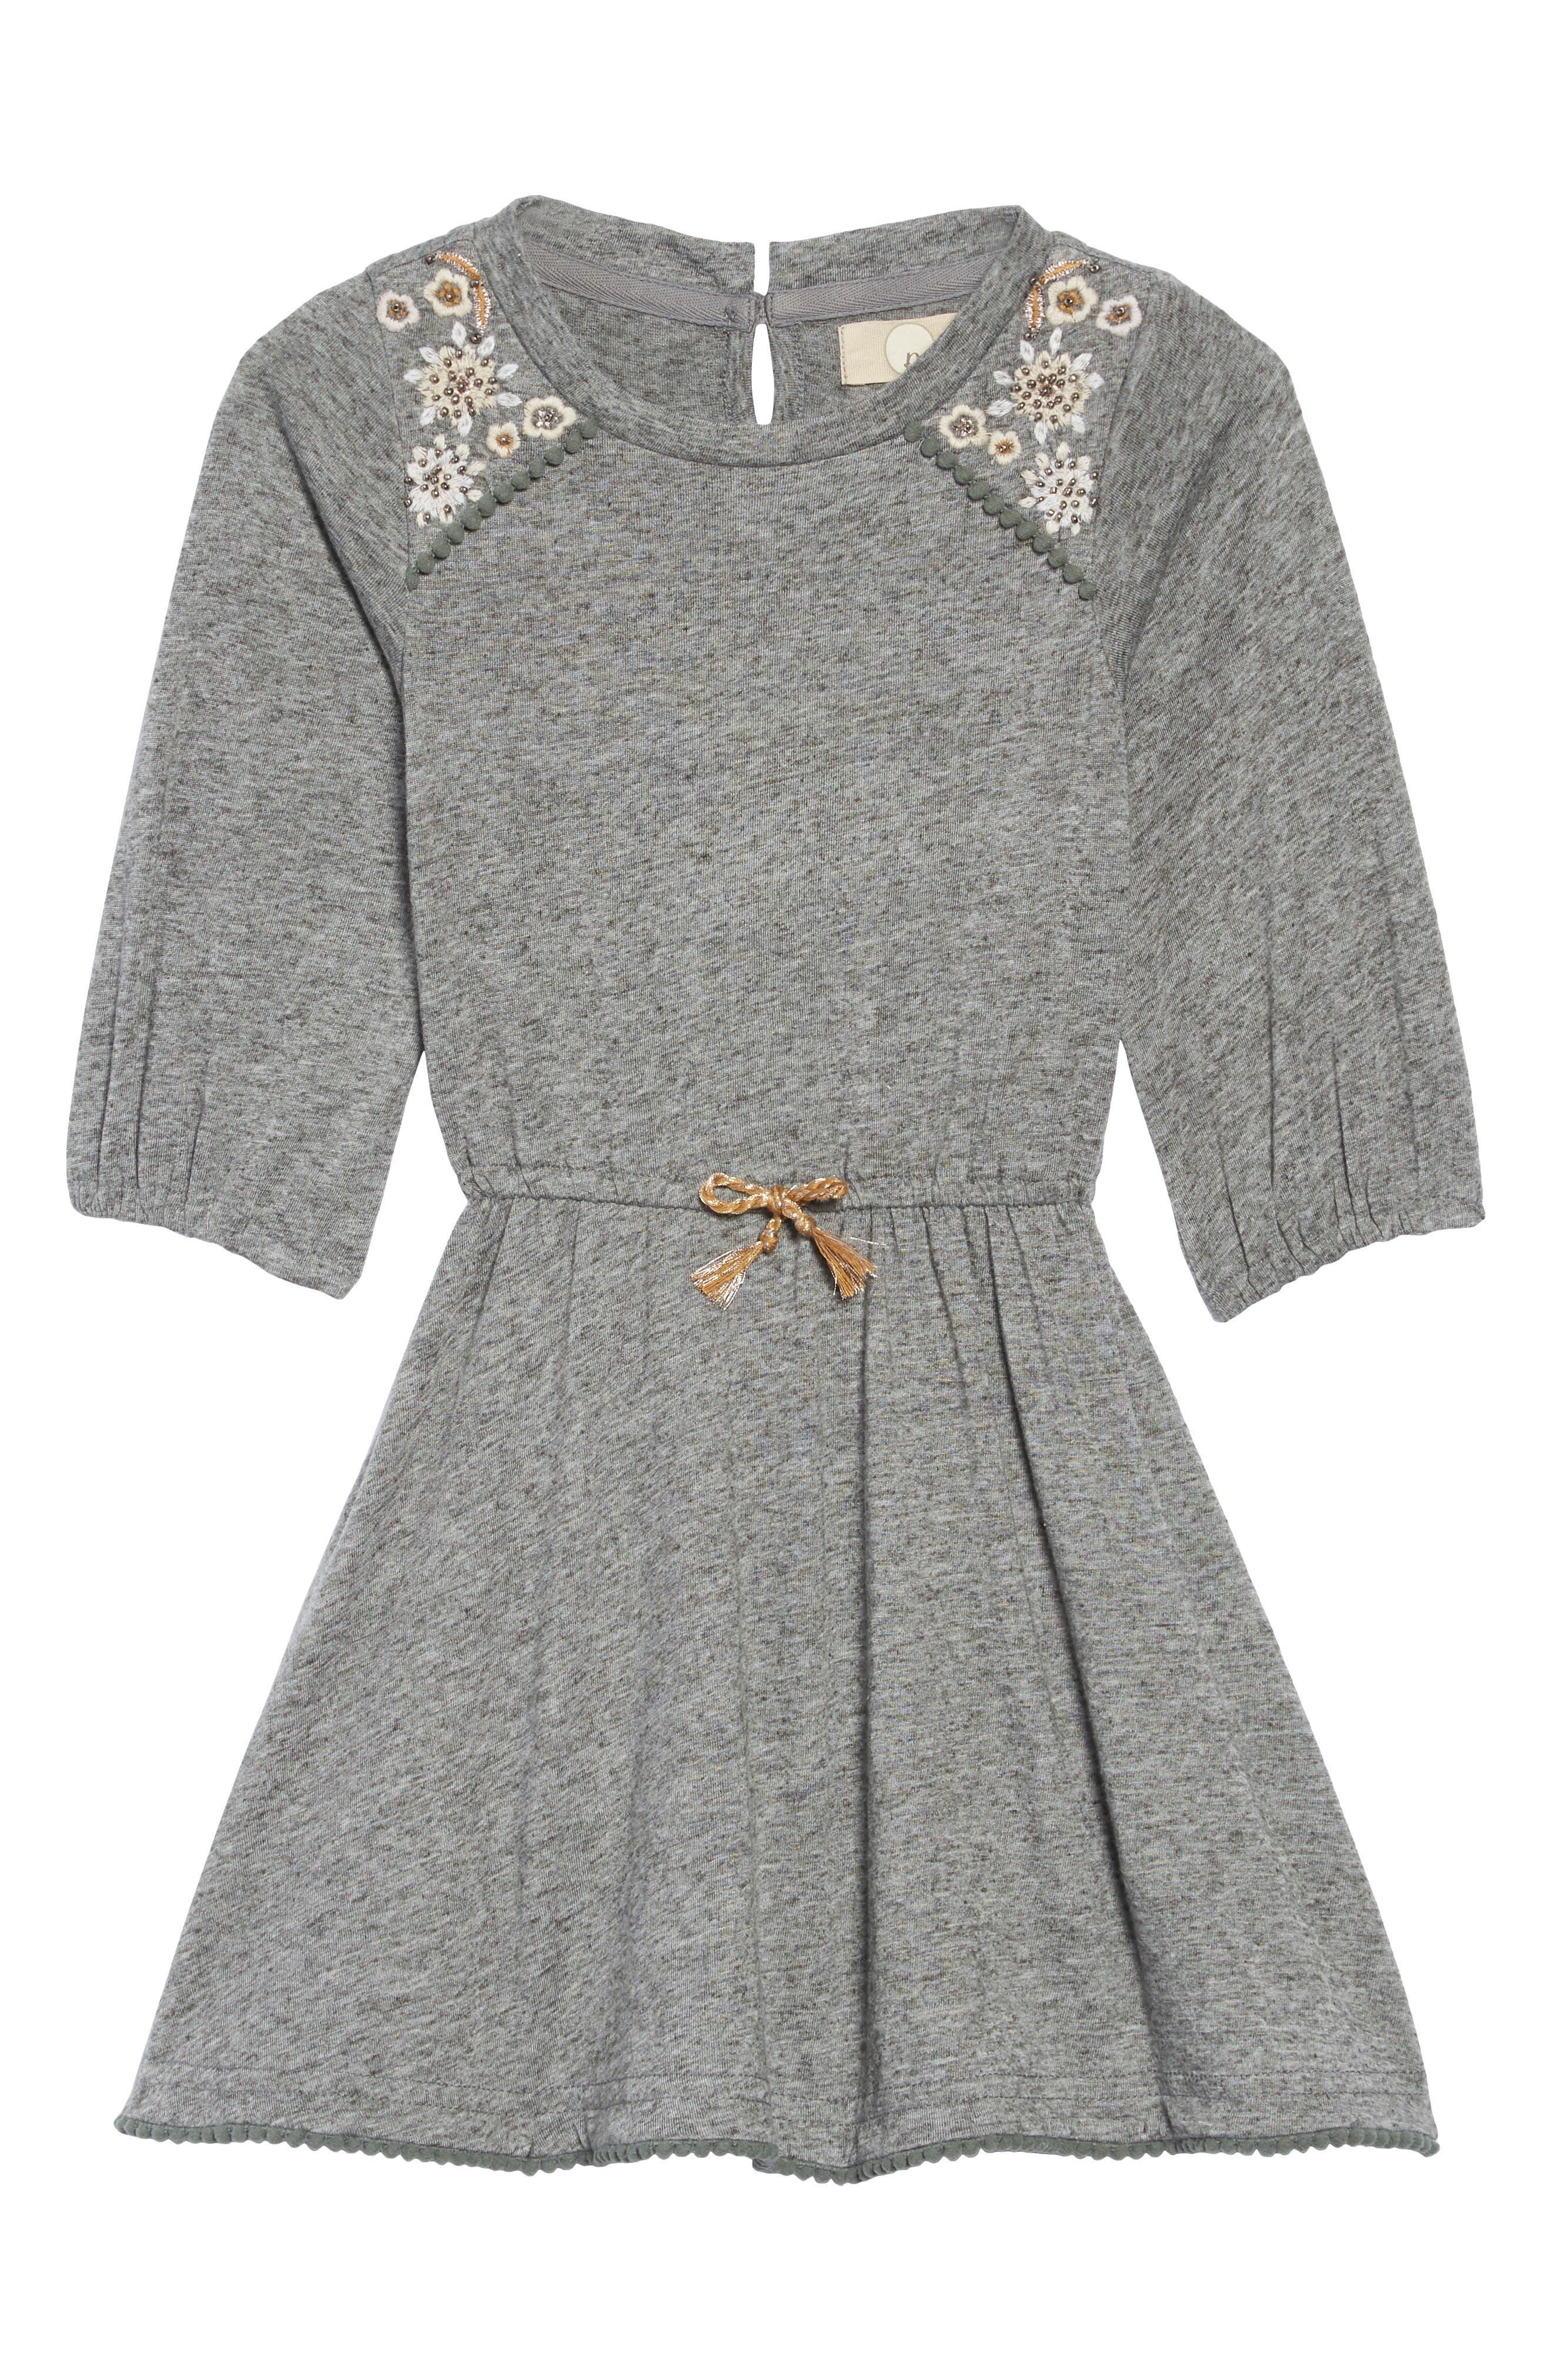 Peek Morgan Embellished Dress,                             Main thumbnail 1, color,                             031